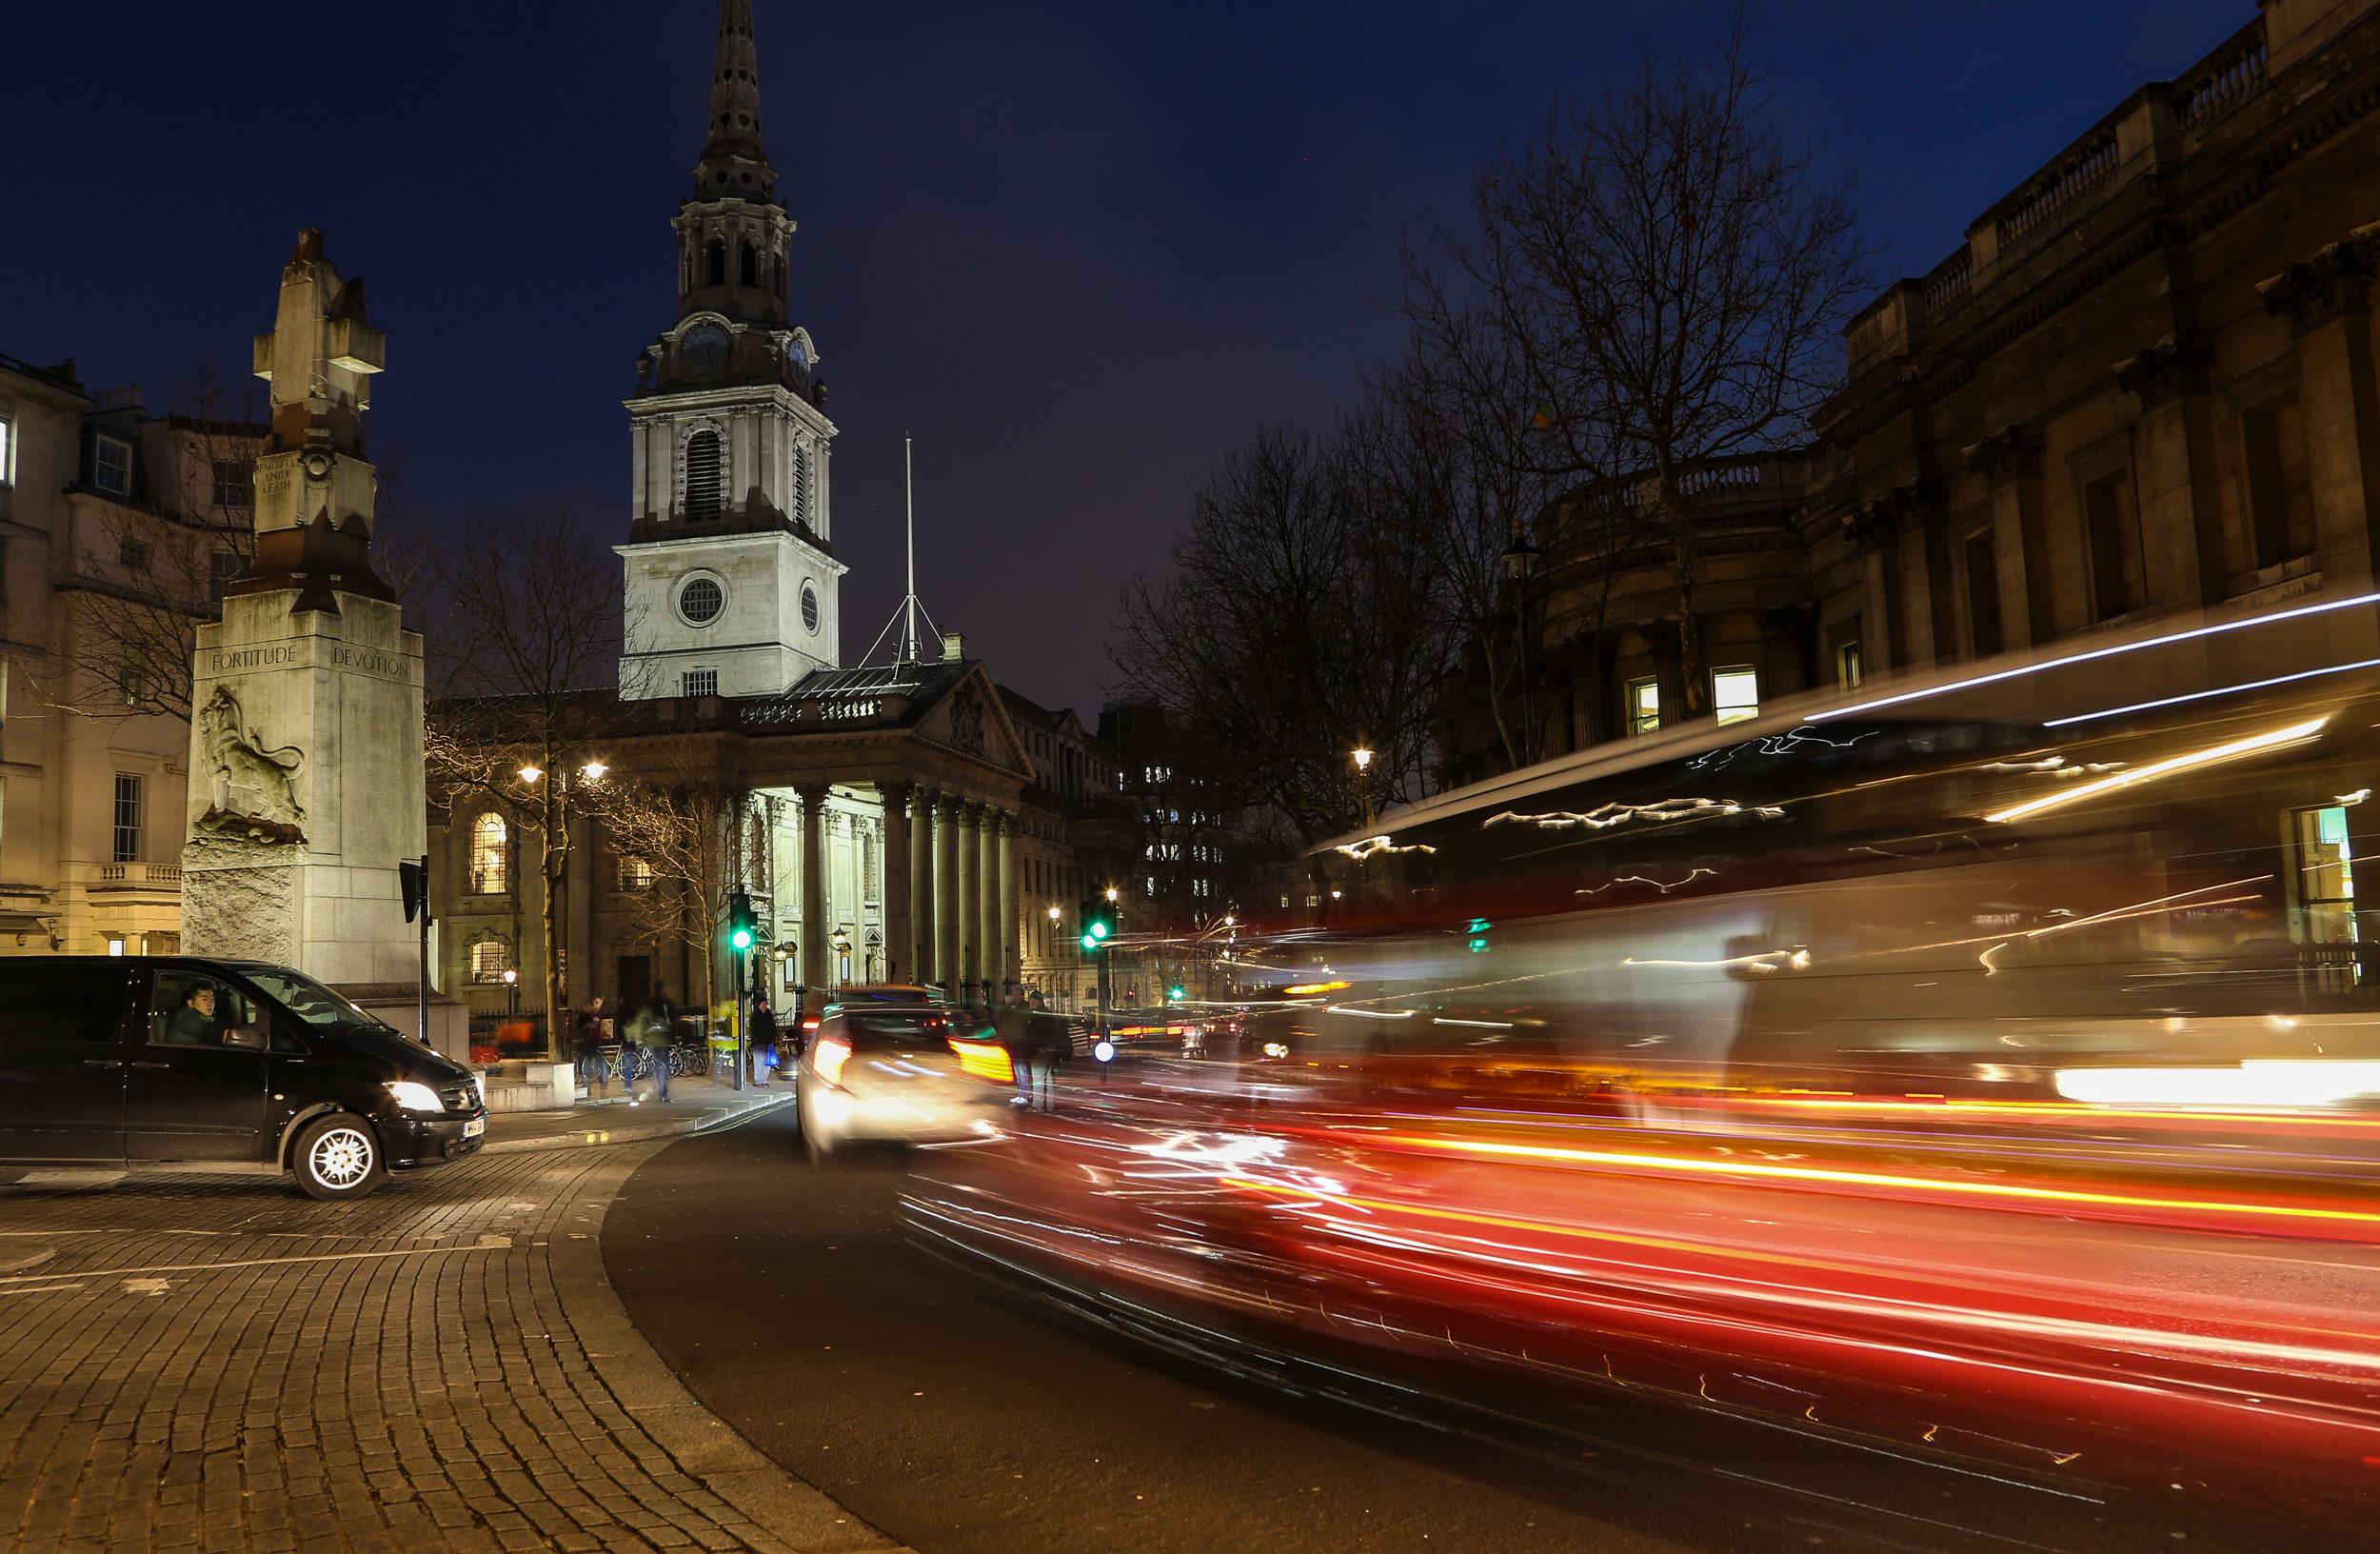 Urban-london-eve-lights-1.jpg